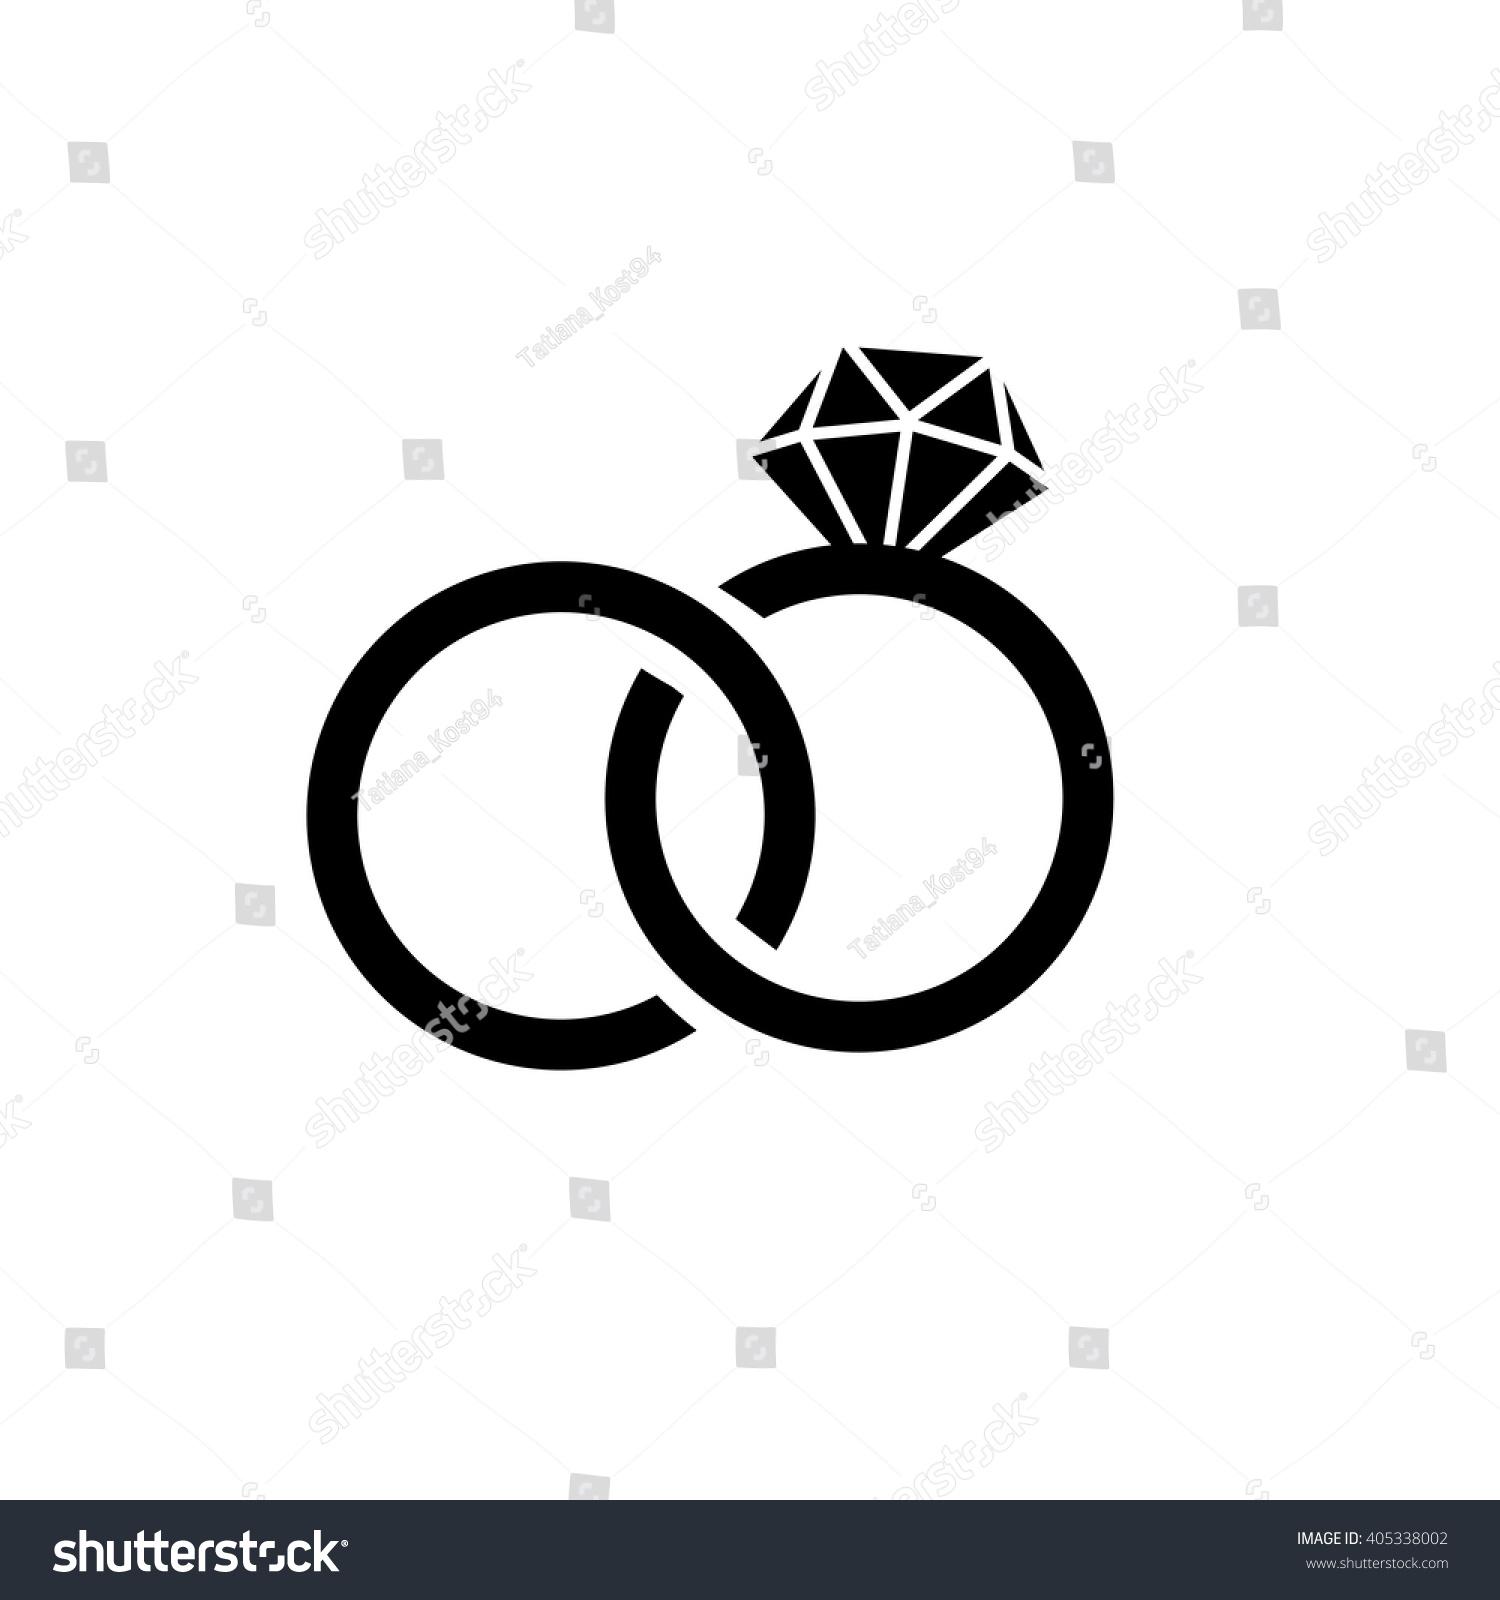 Wedding rings symbol  Wedding Ringsvector Flat Icon Isolatedmodern Simple Stock Vector ...